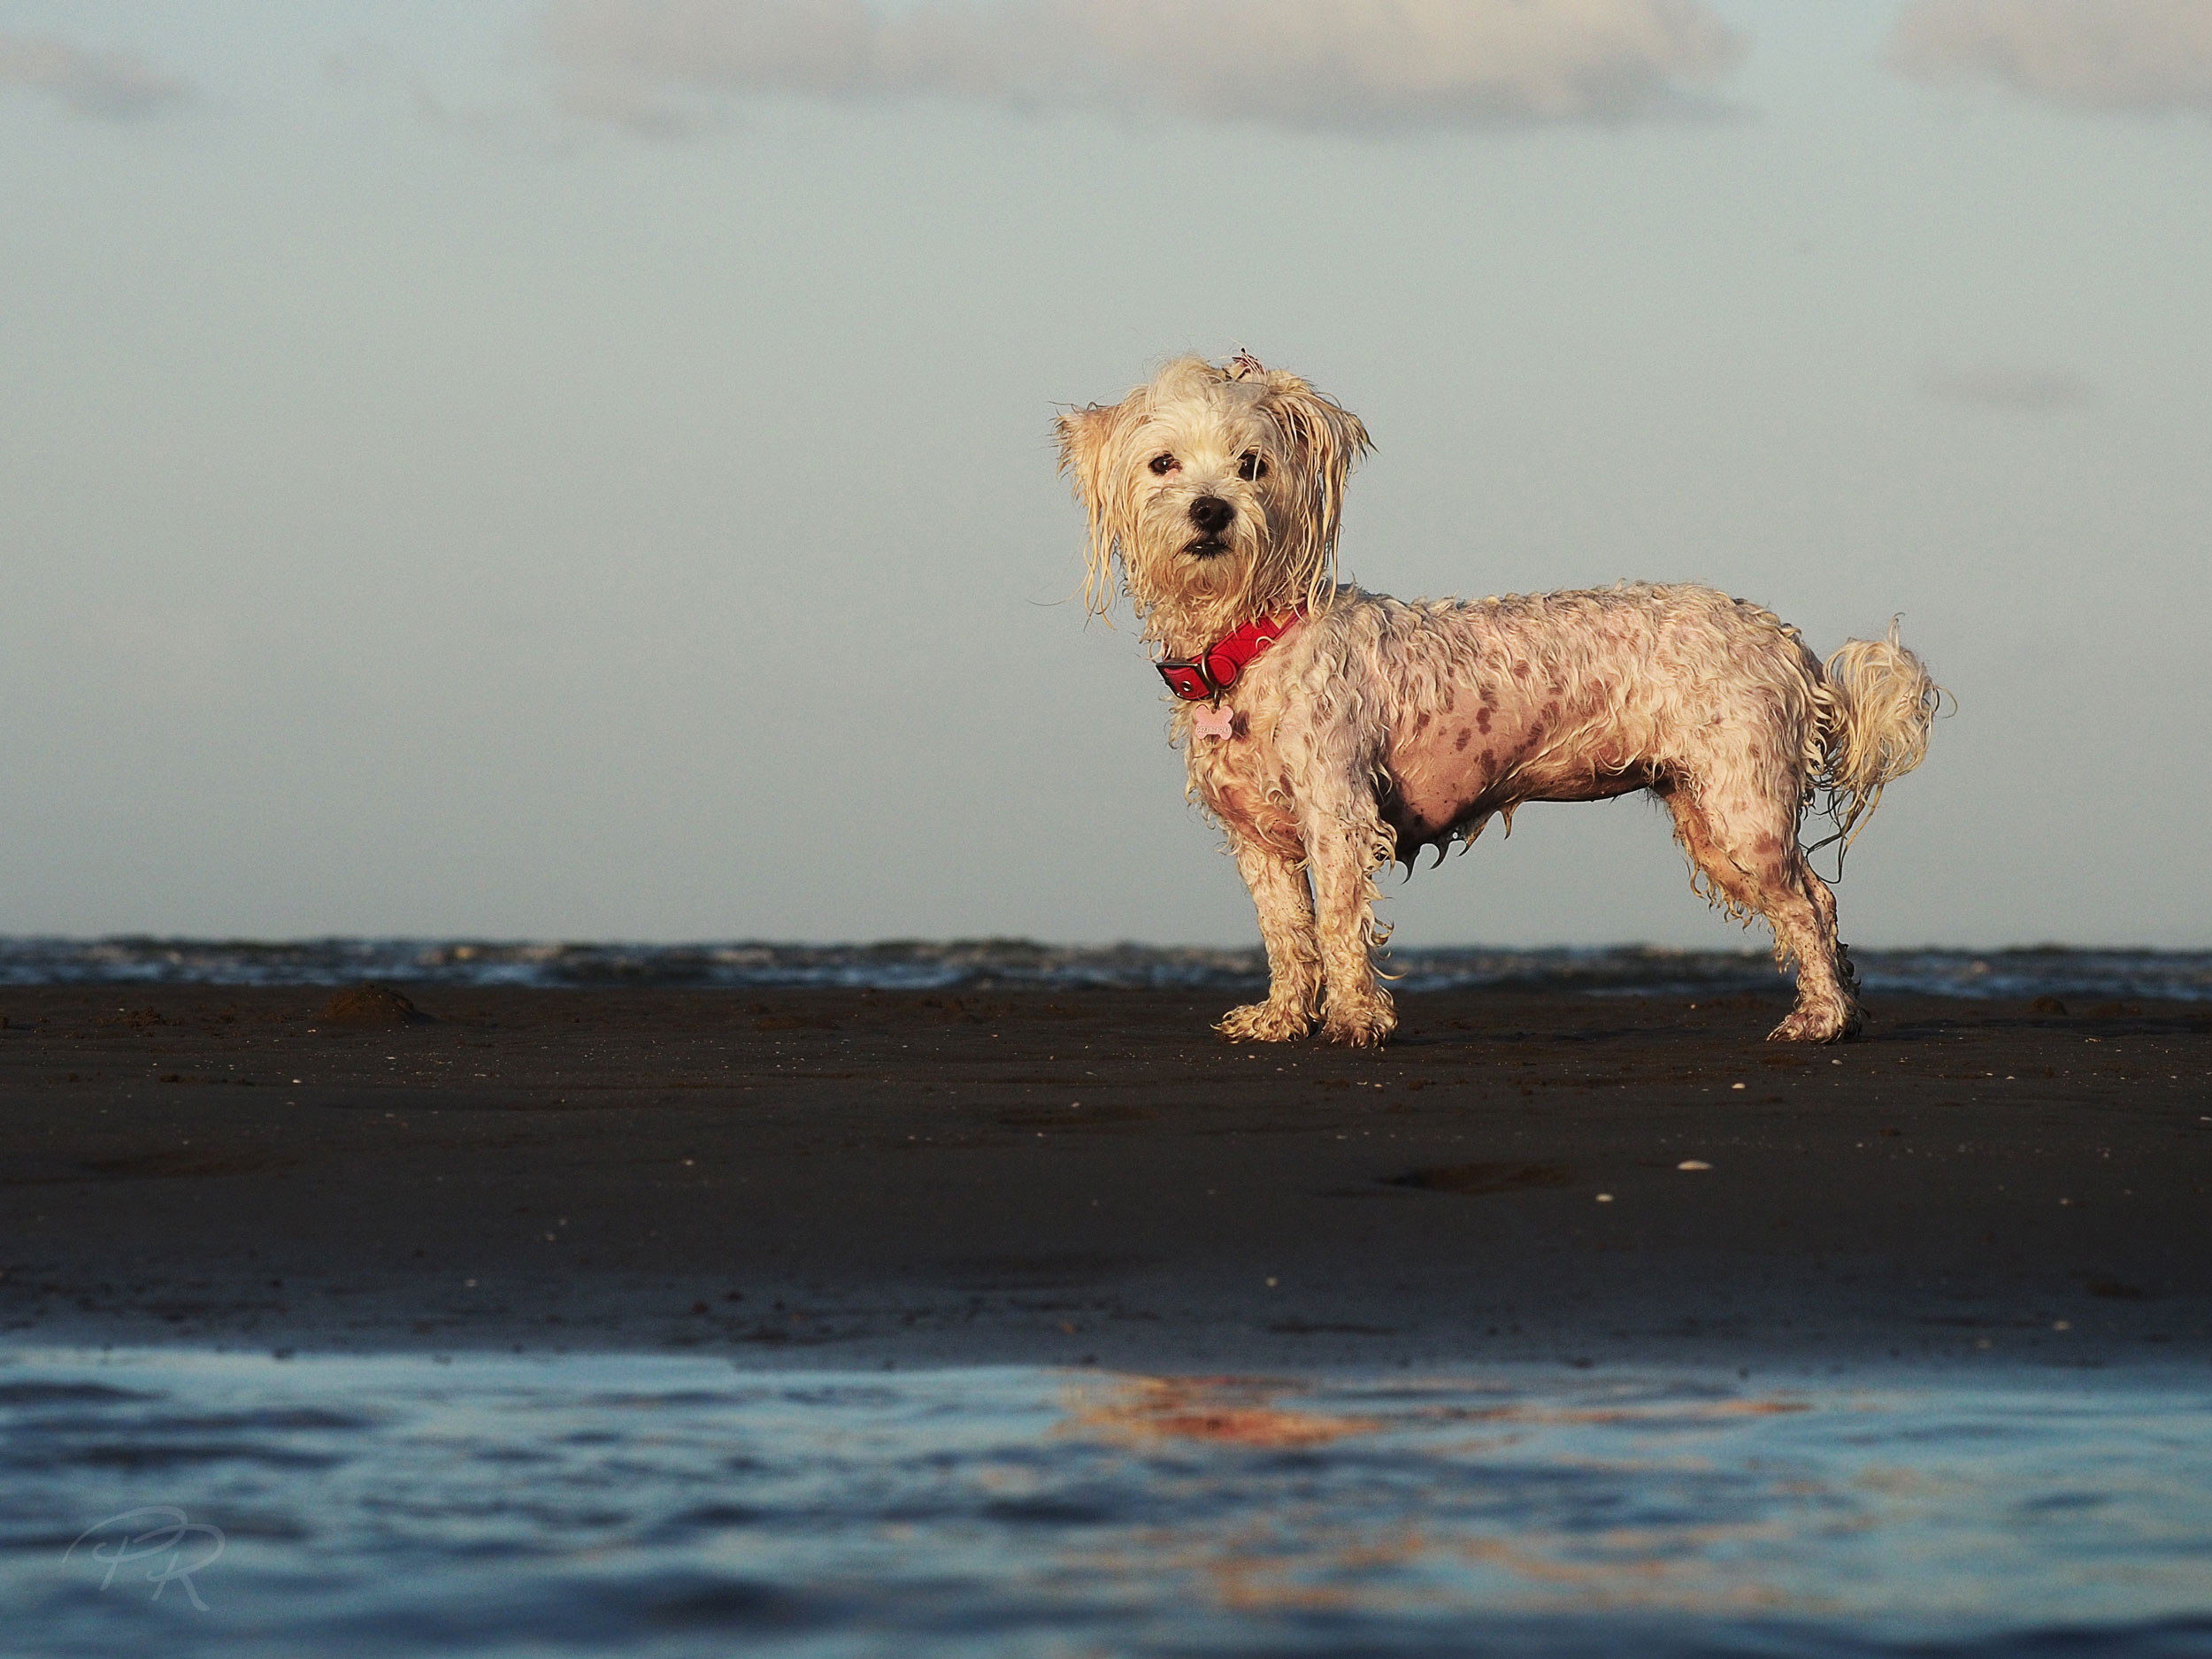 Poodle-Nudgee-White-dog_1_cr.jpg